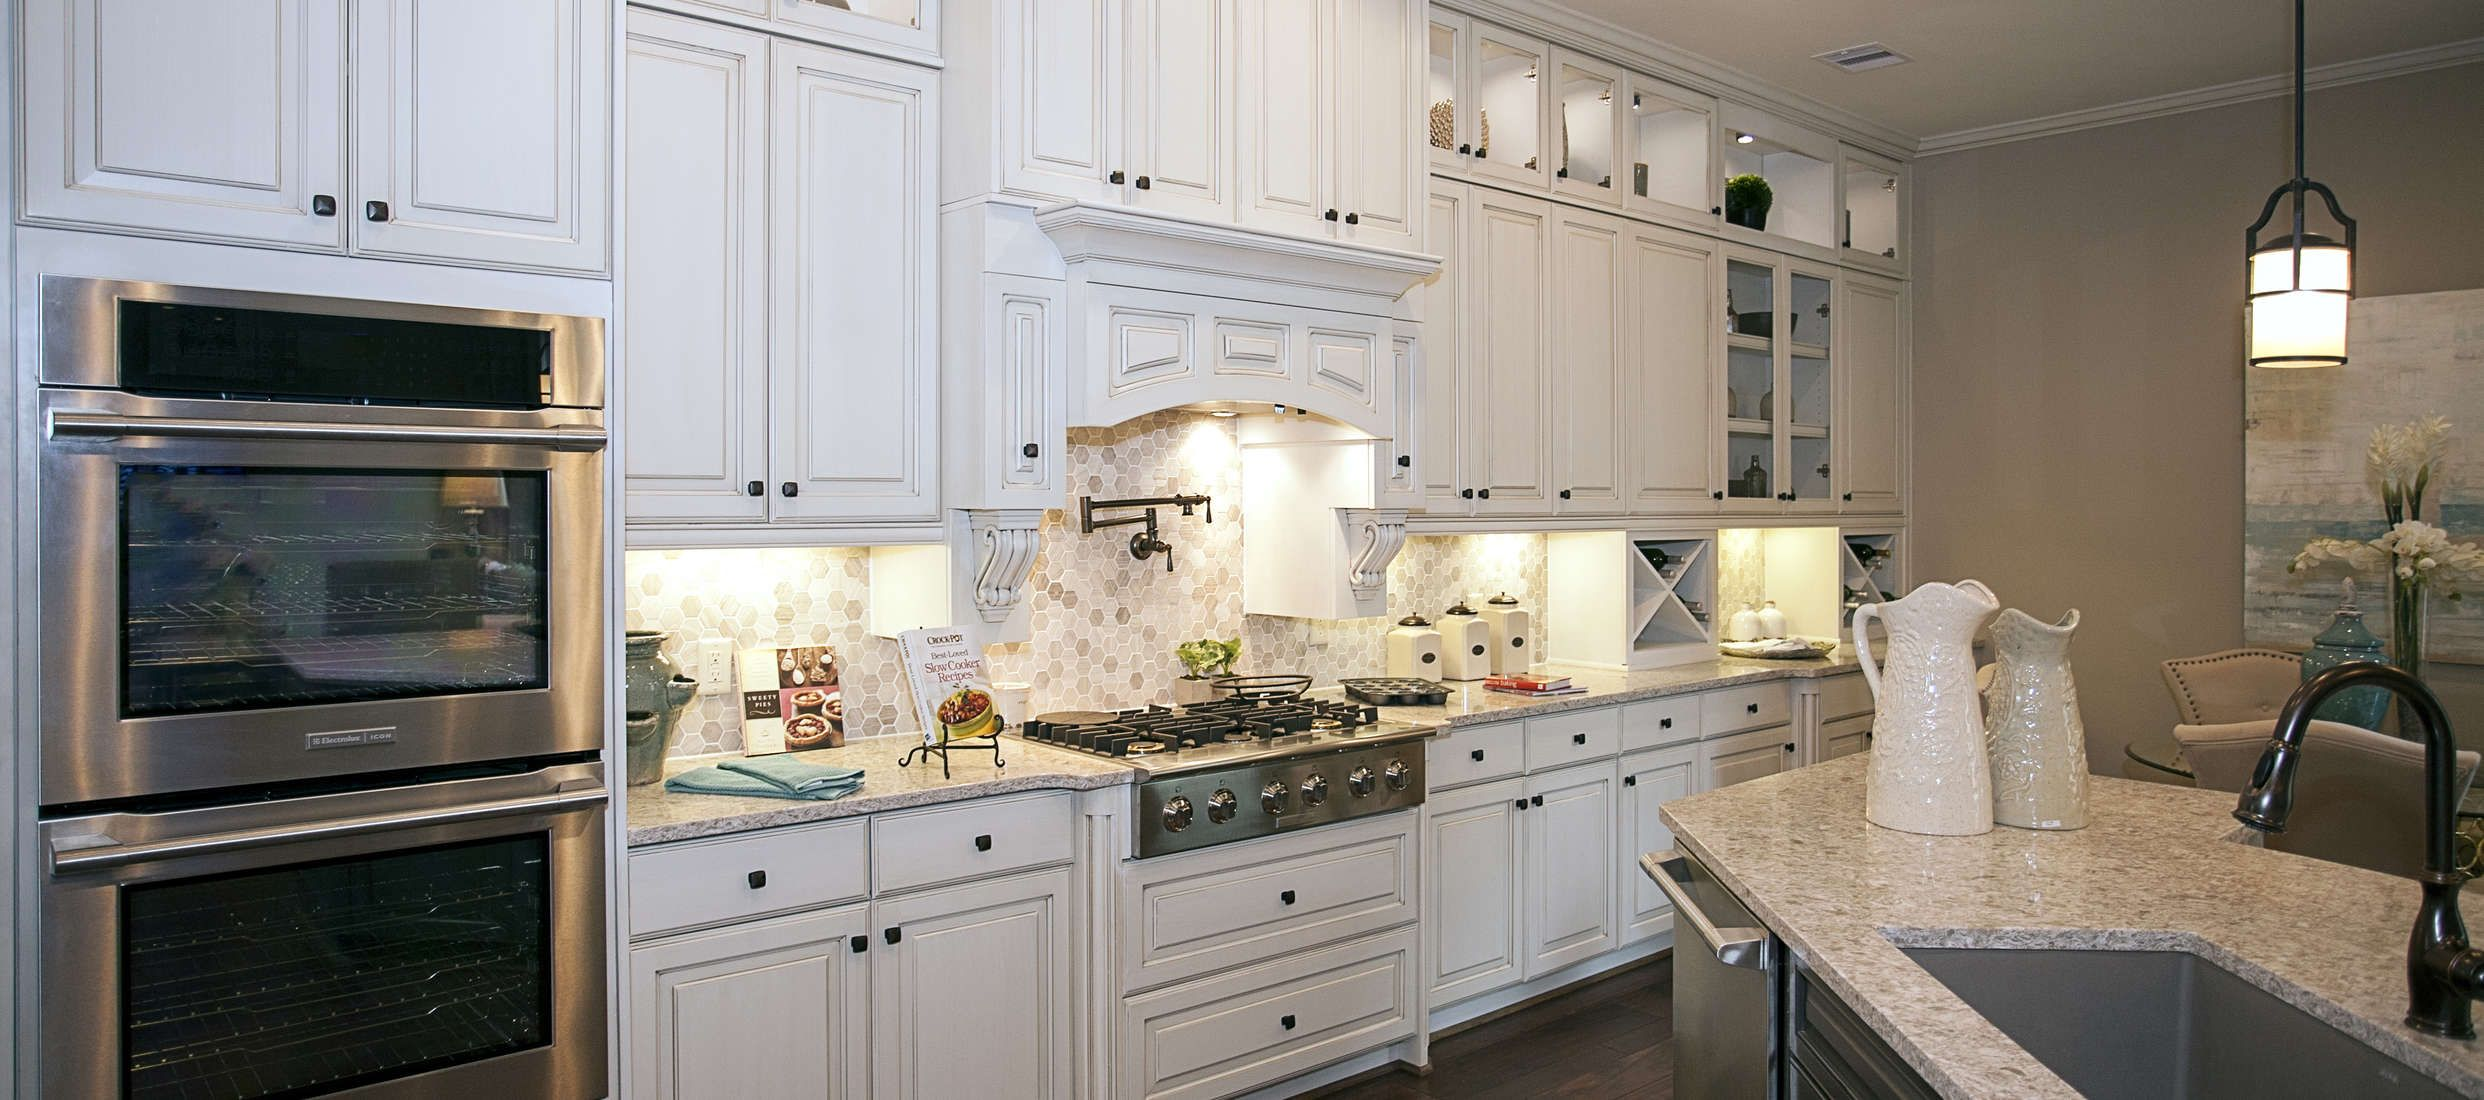 Best J Kraft Inc Custom Cabinets By Houston Cabinet Company 400 x 300